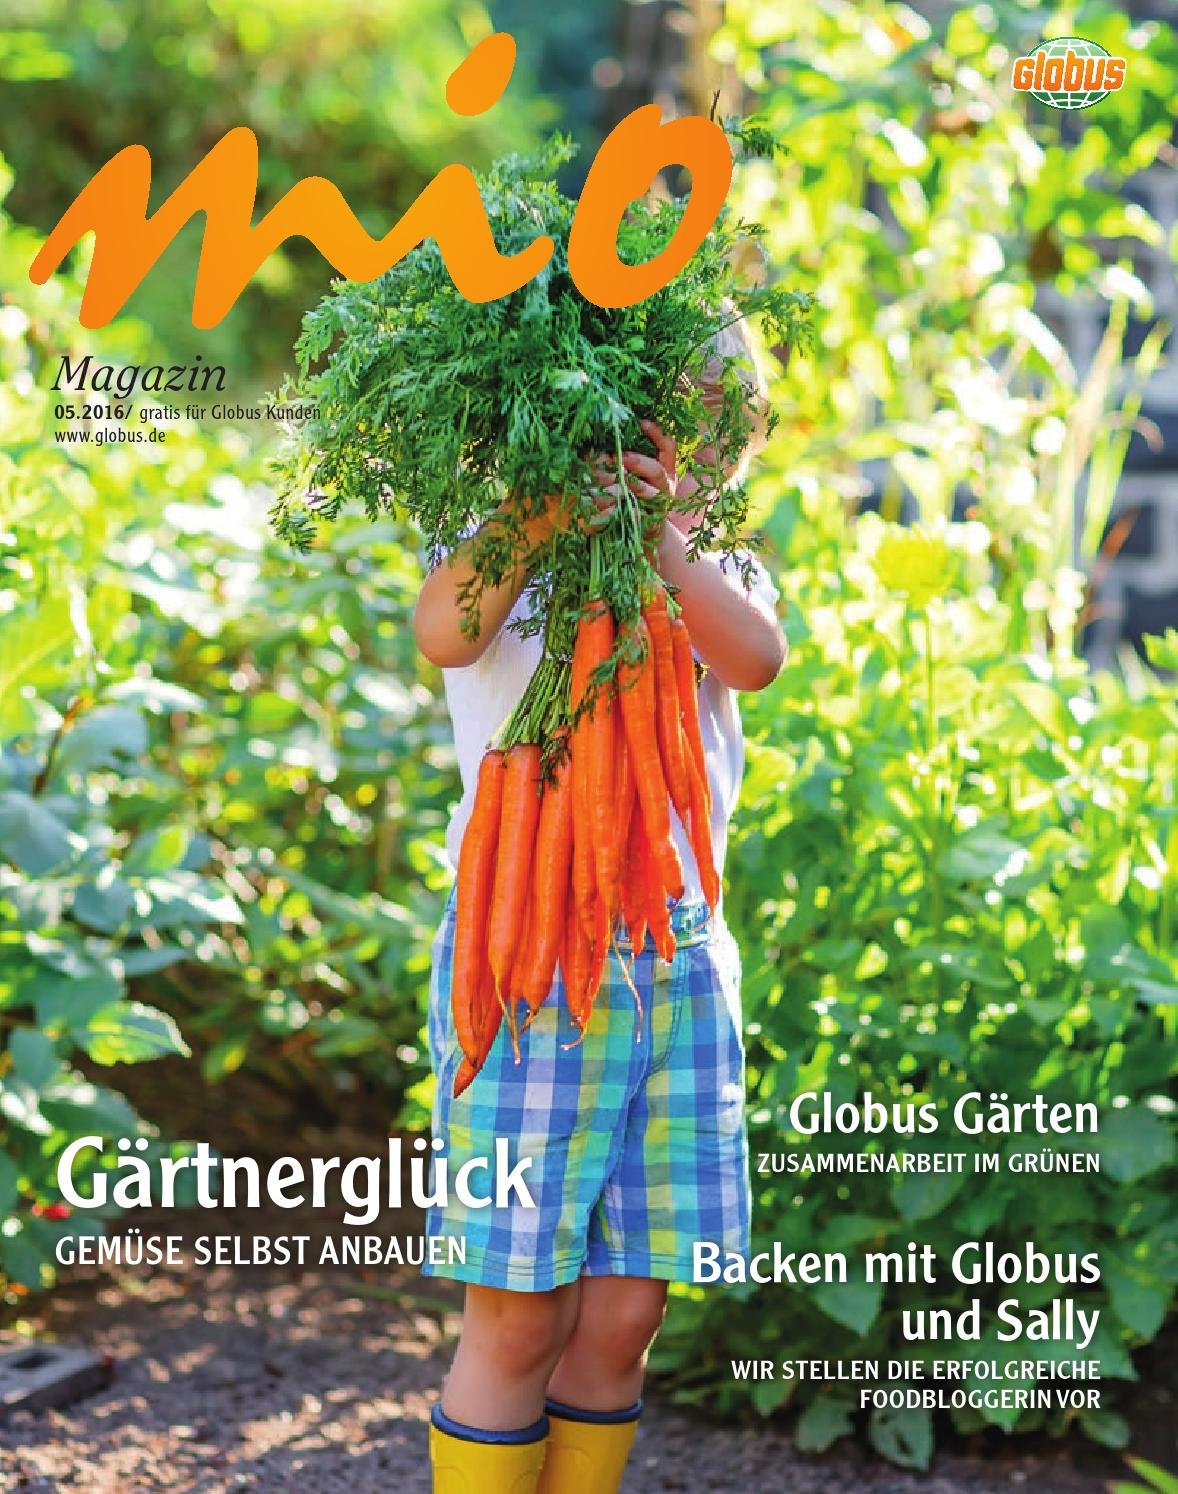 mio1605 by Globus SB-Warenhaus Holding GmbH & Co. KG - issuu